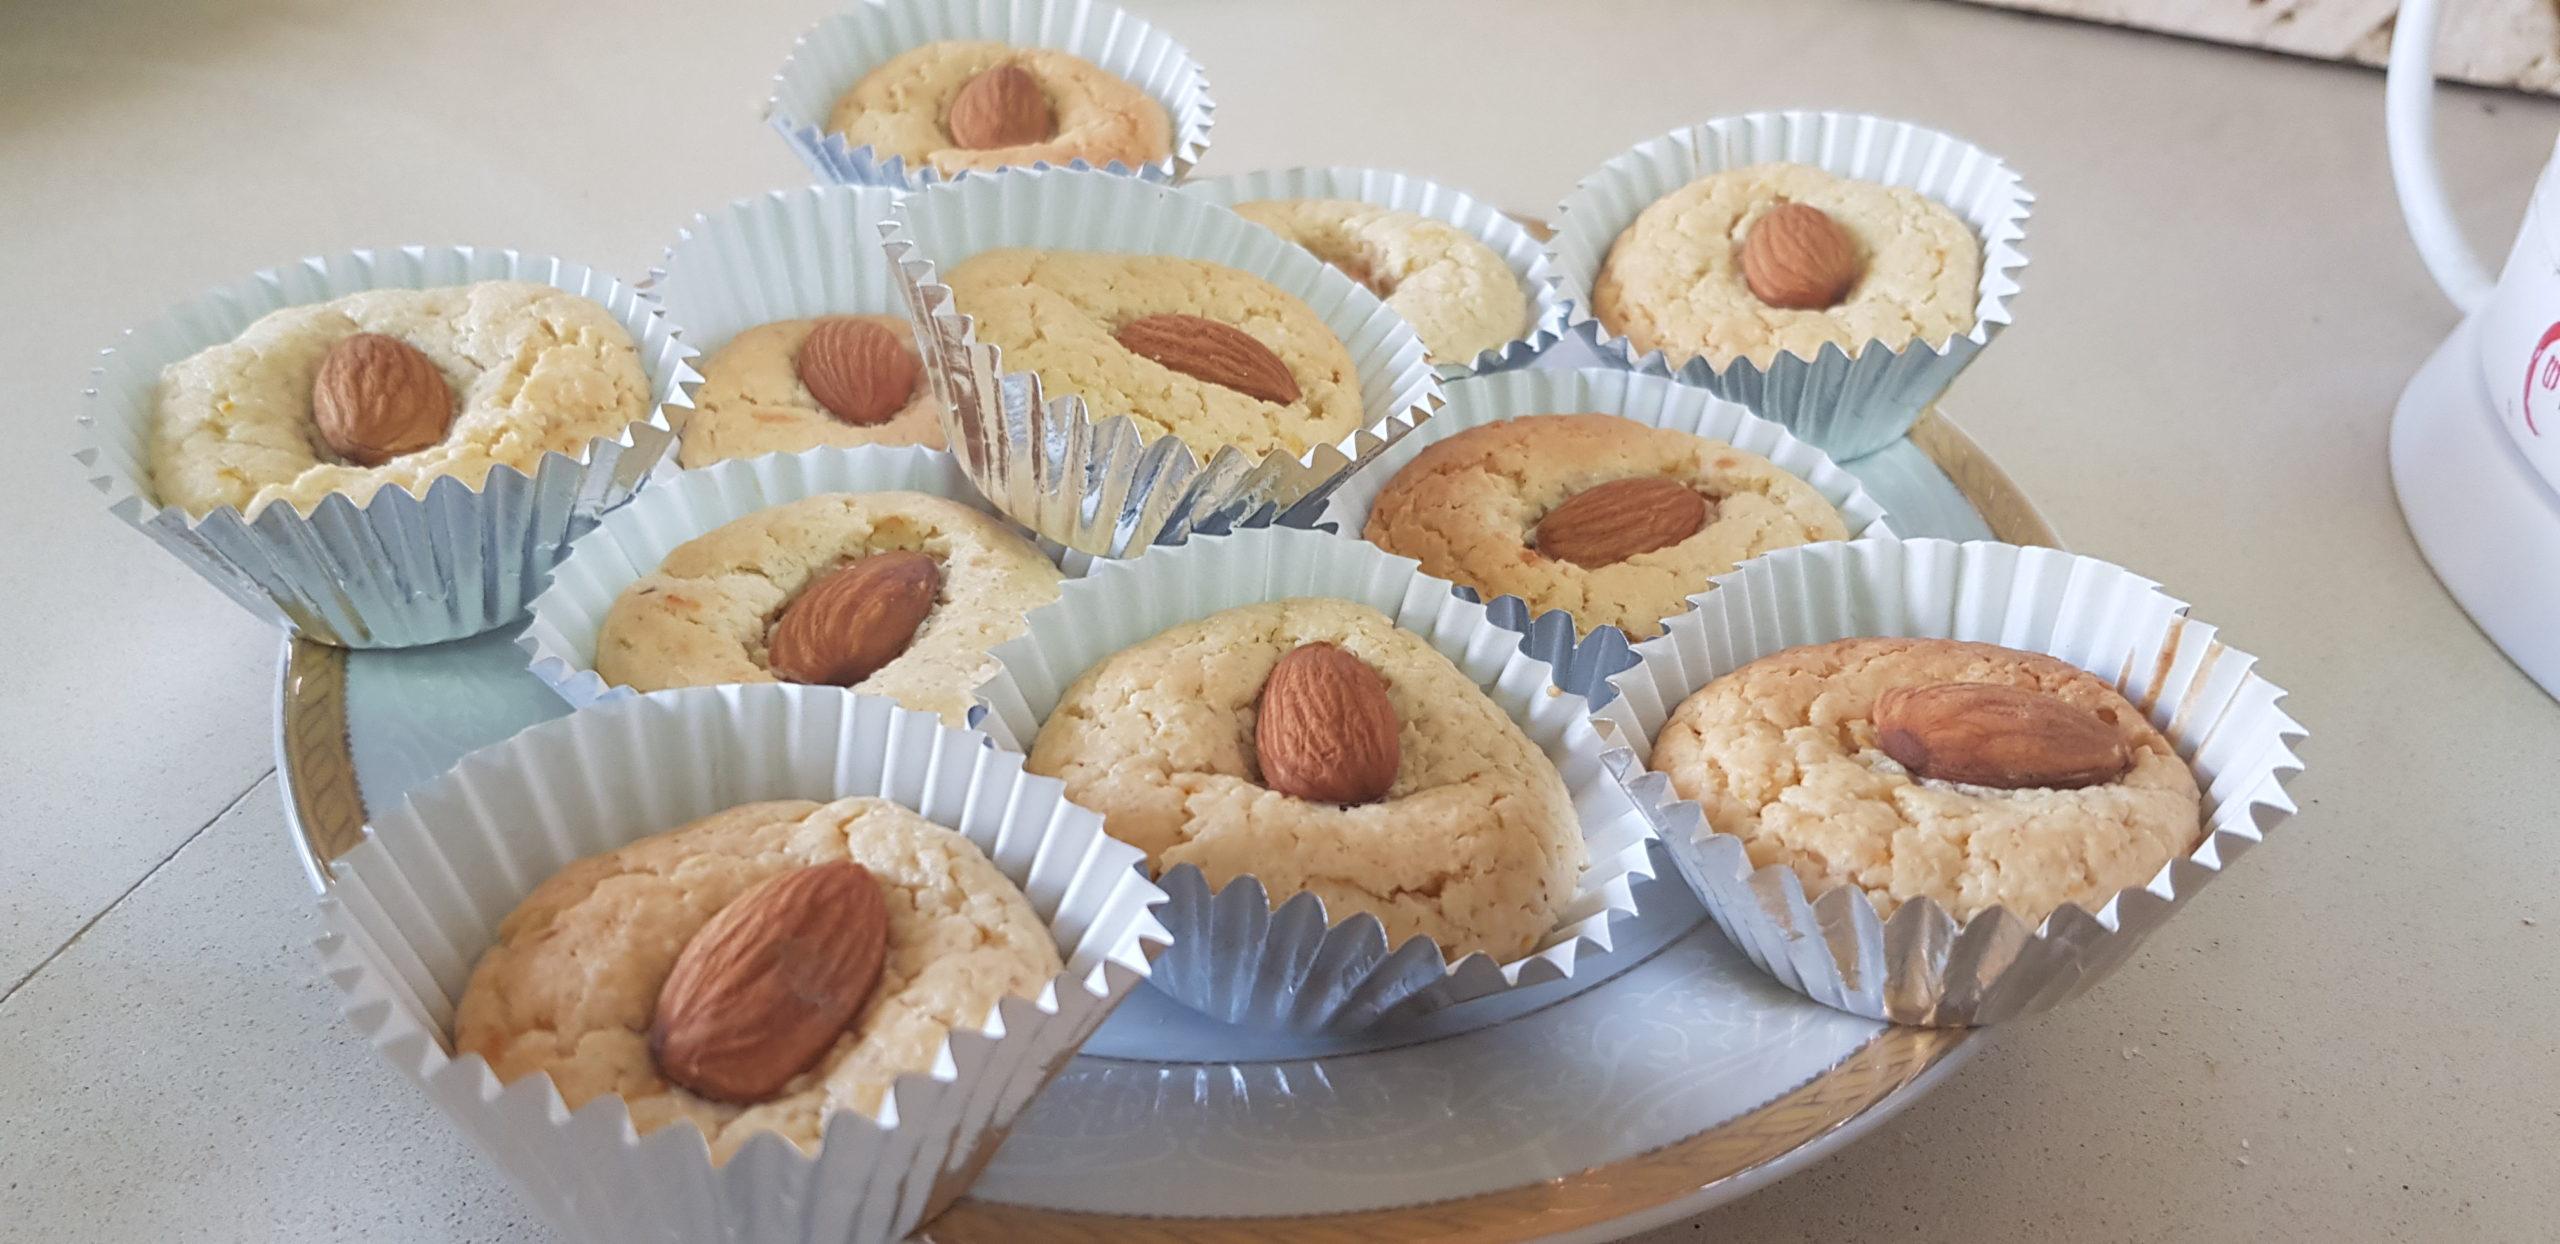 Les macarons tunisiens de Pessah !